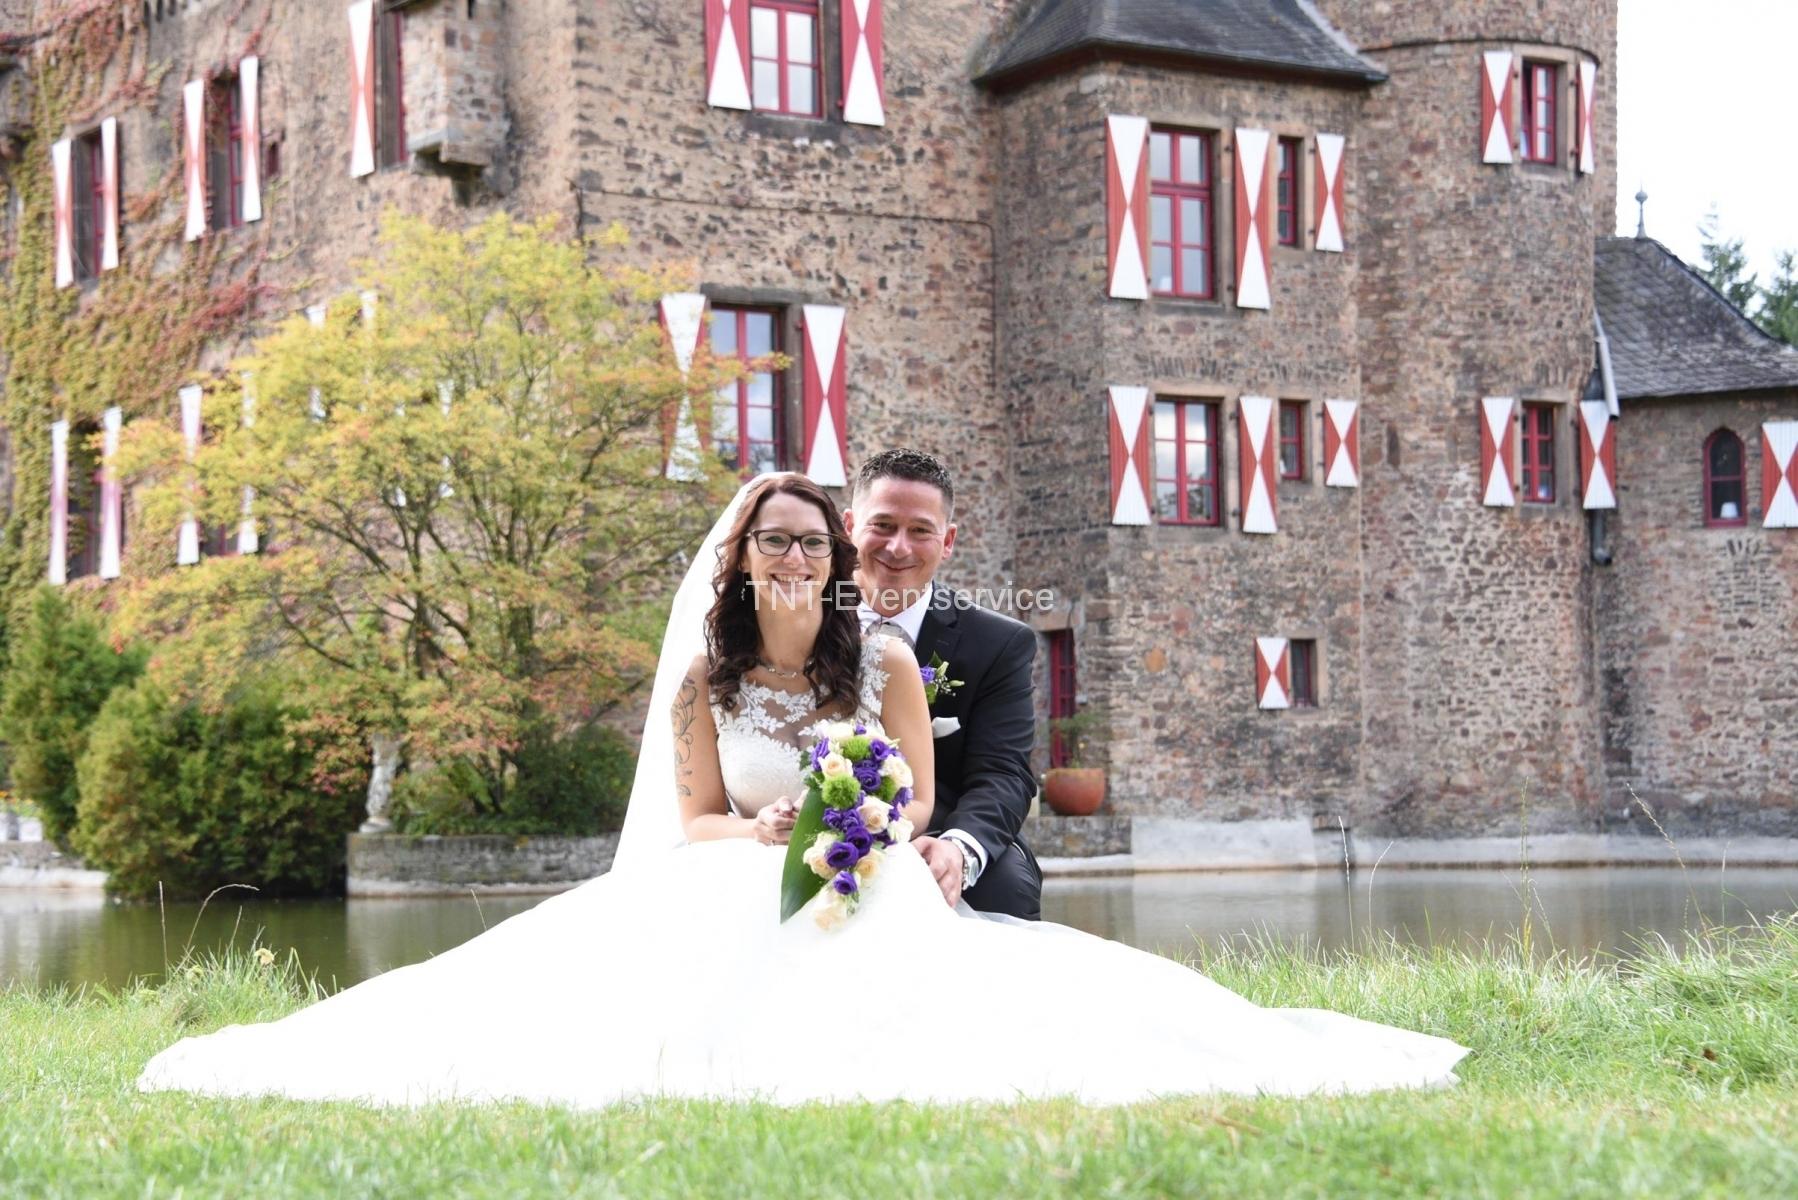 Hochzeit Krick 15.09 (421) (Copy)